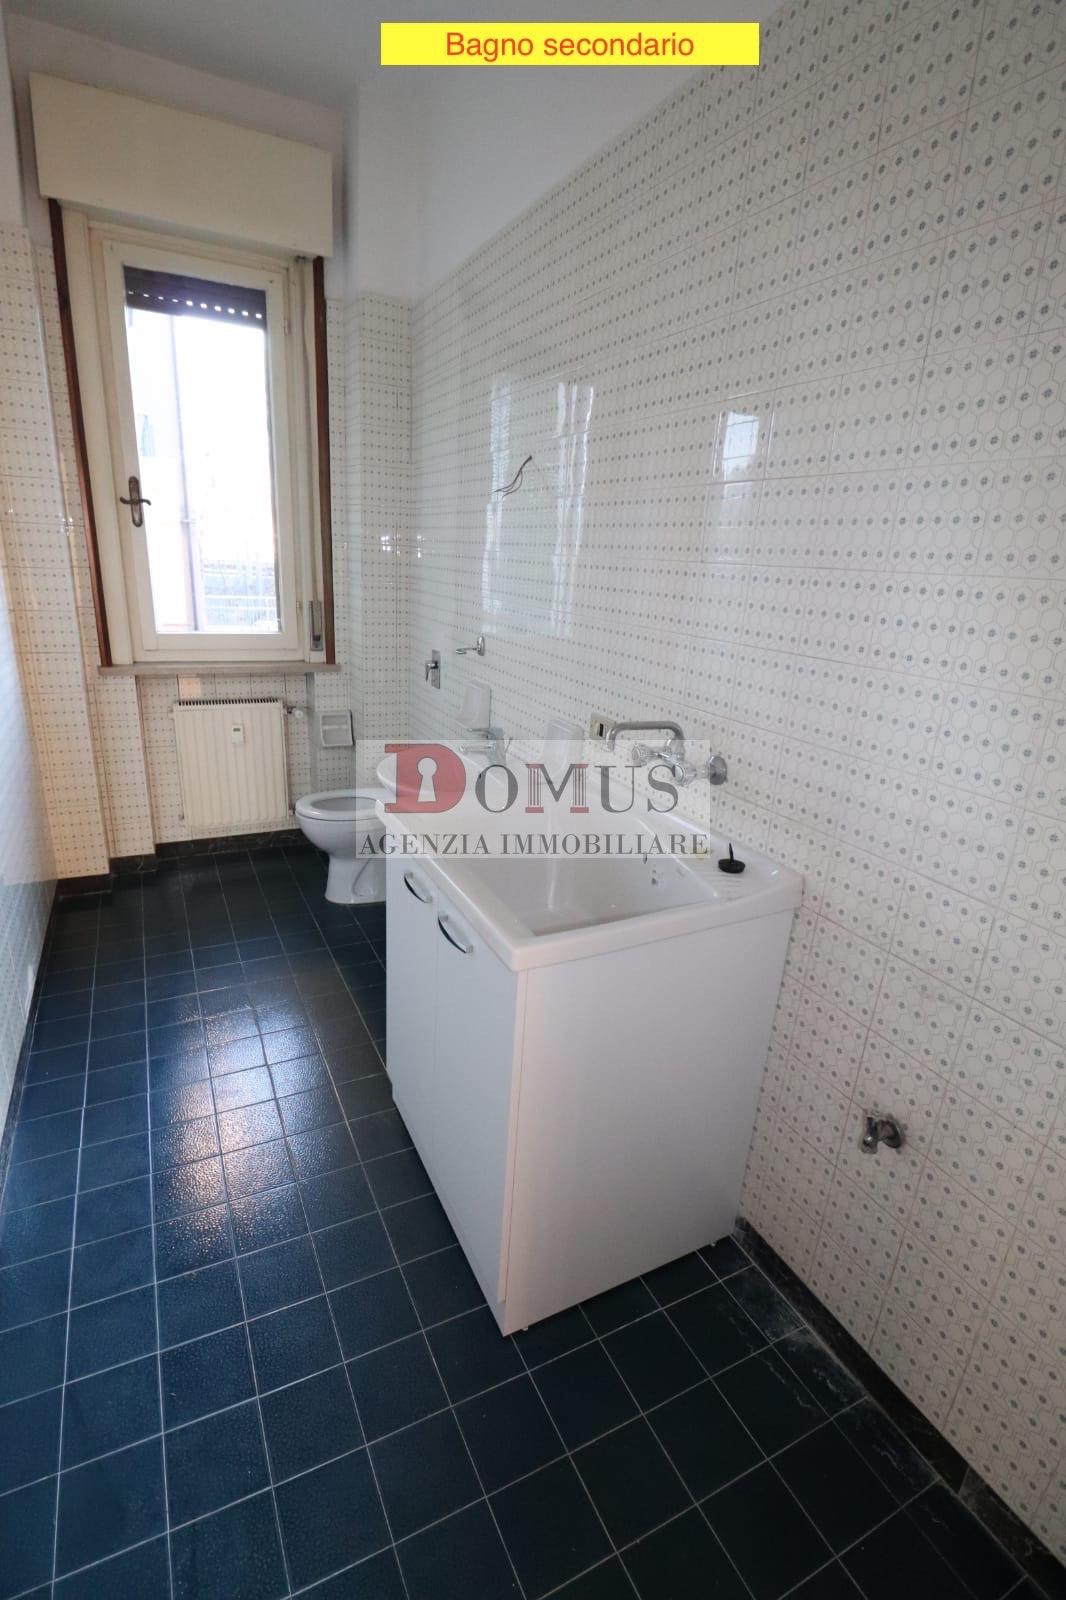 Agenzie Immobiliari Mantova quadrilocale in affitto a mantova, rif.a236, n°184305